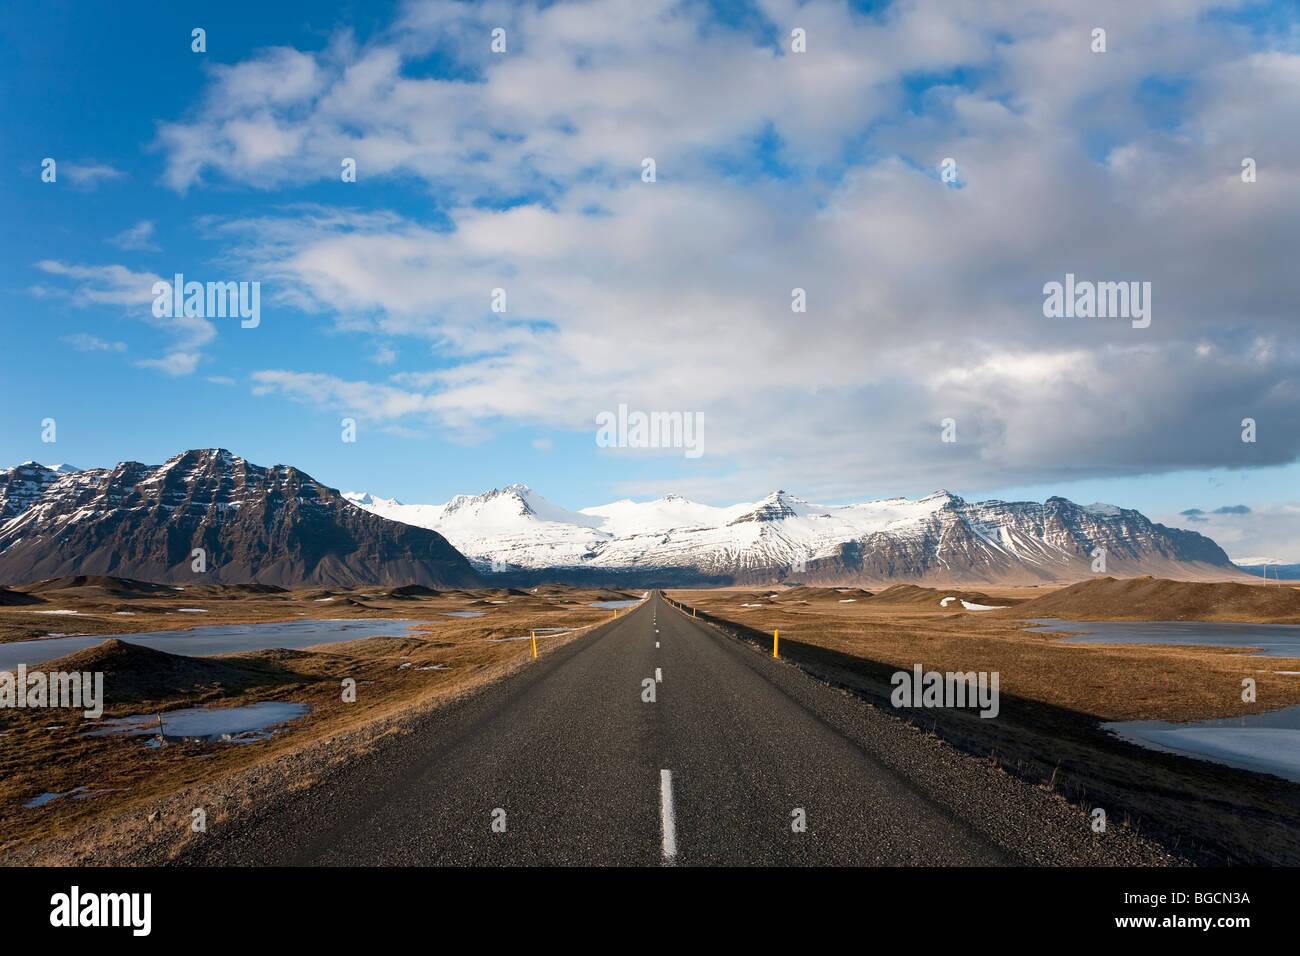 Road nr Jokusarlon, nr Hofn, S.Iceland - Stock Image